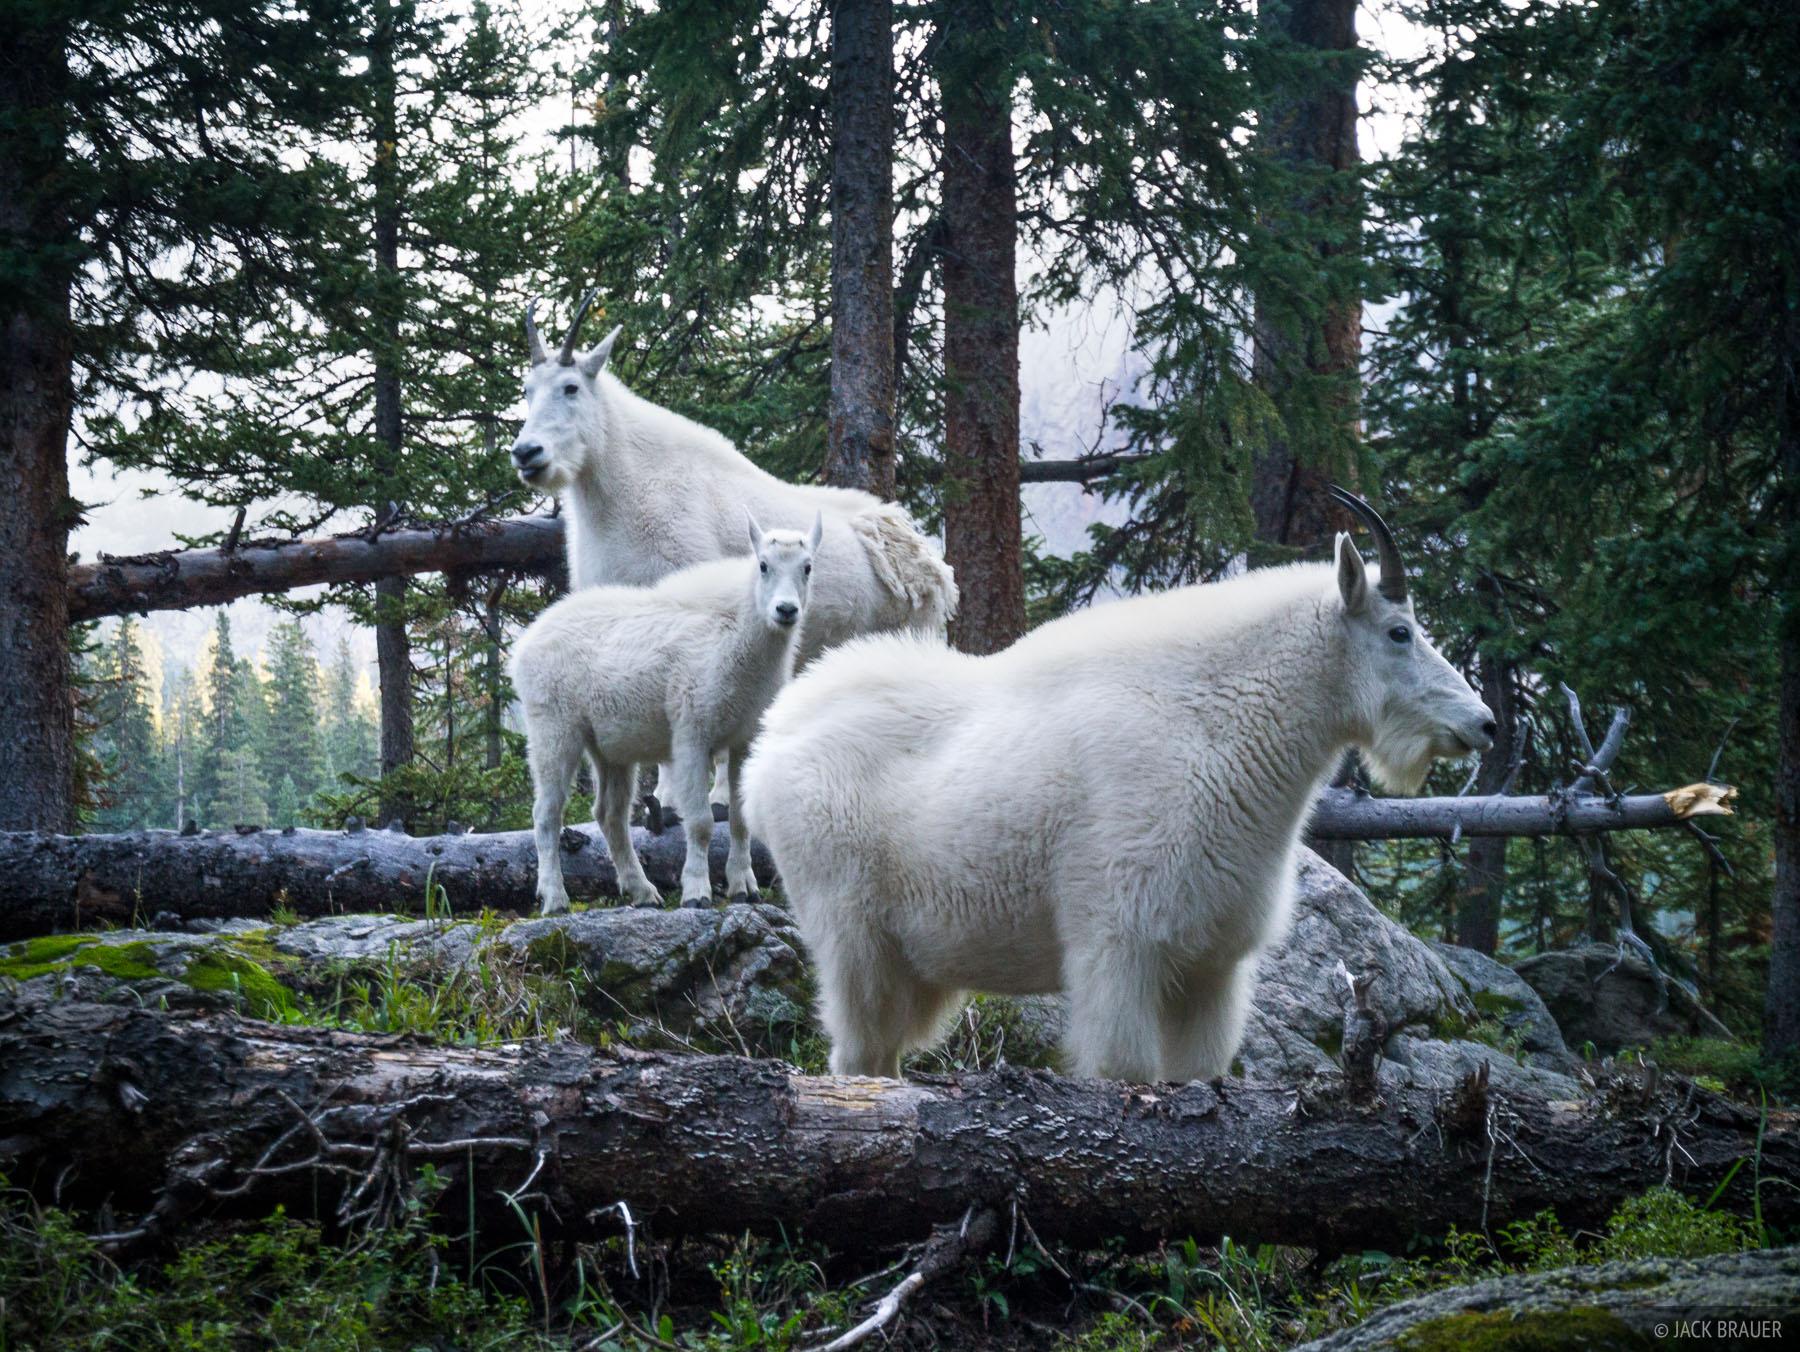 Mountain goats, Weminuche Wilderness, San Juan Mountains, Colorado, photo